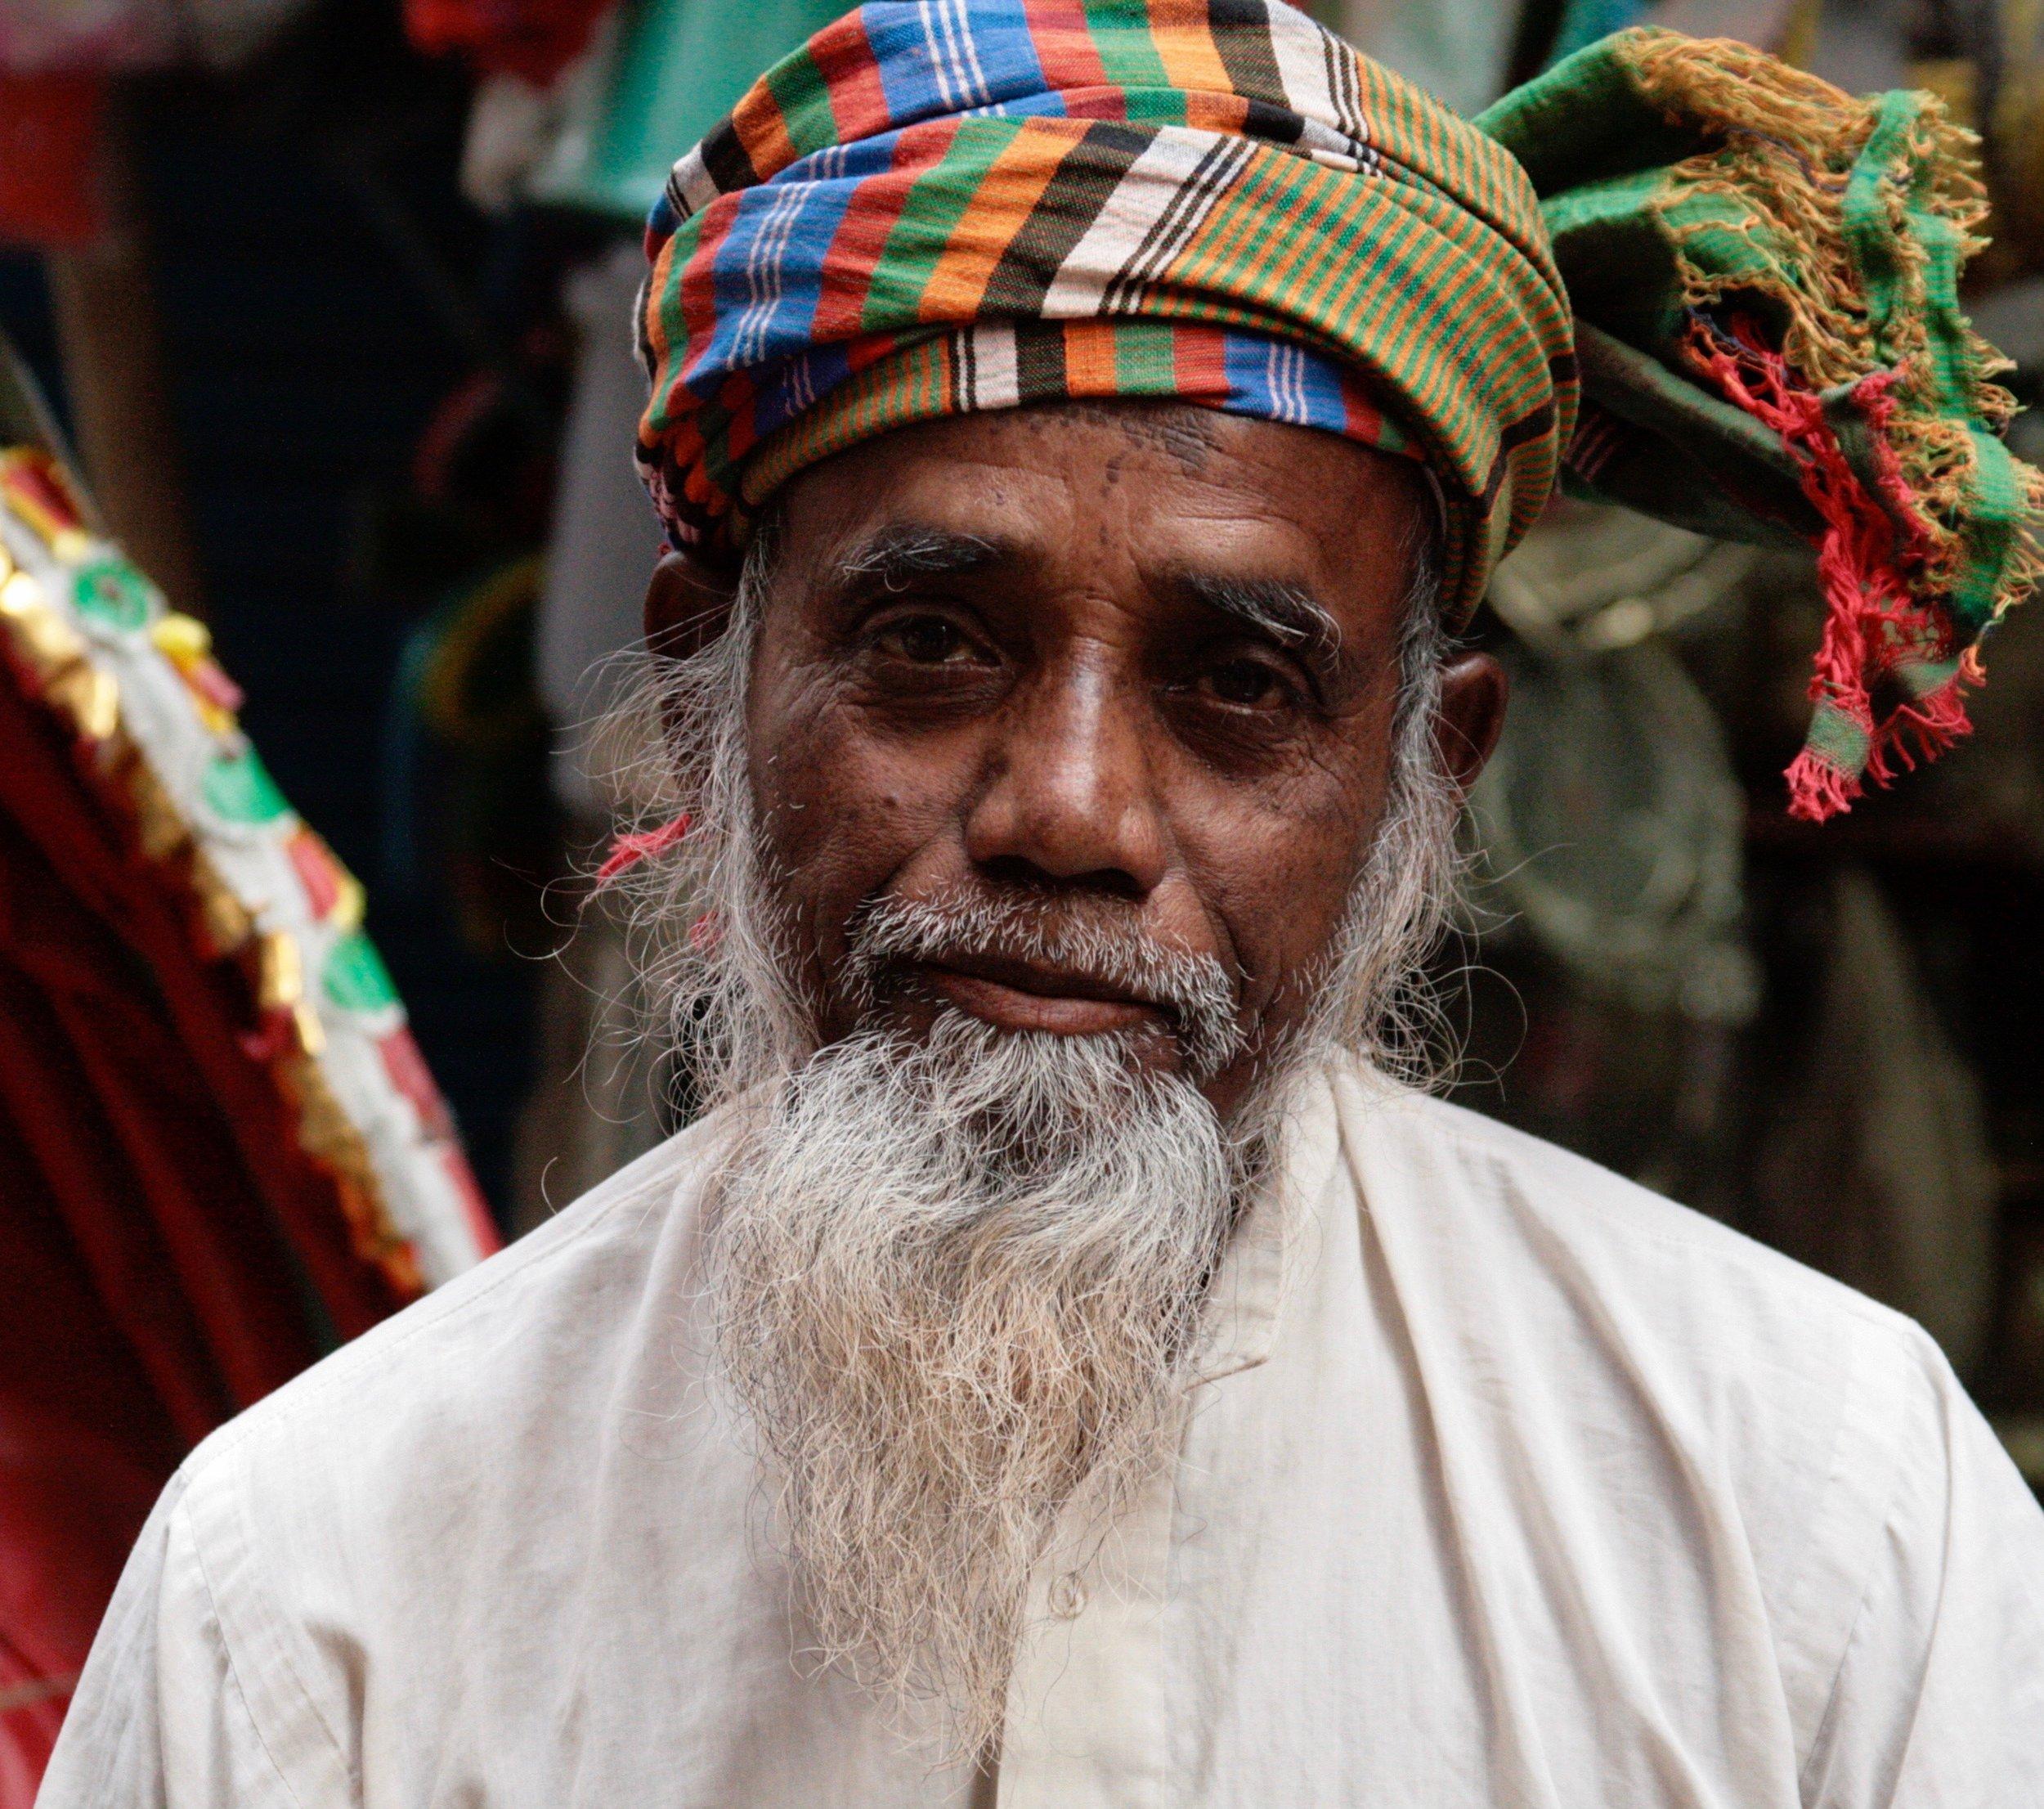 People-Bangladesih Main with Turban.jpg